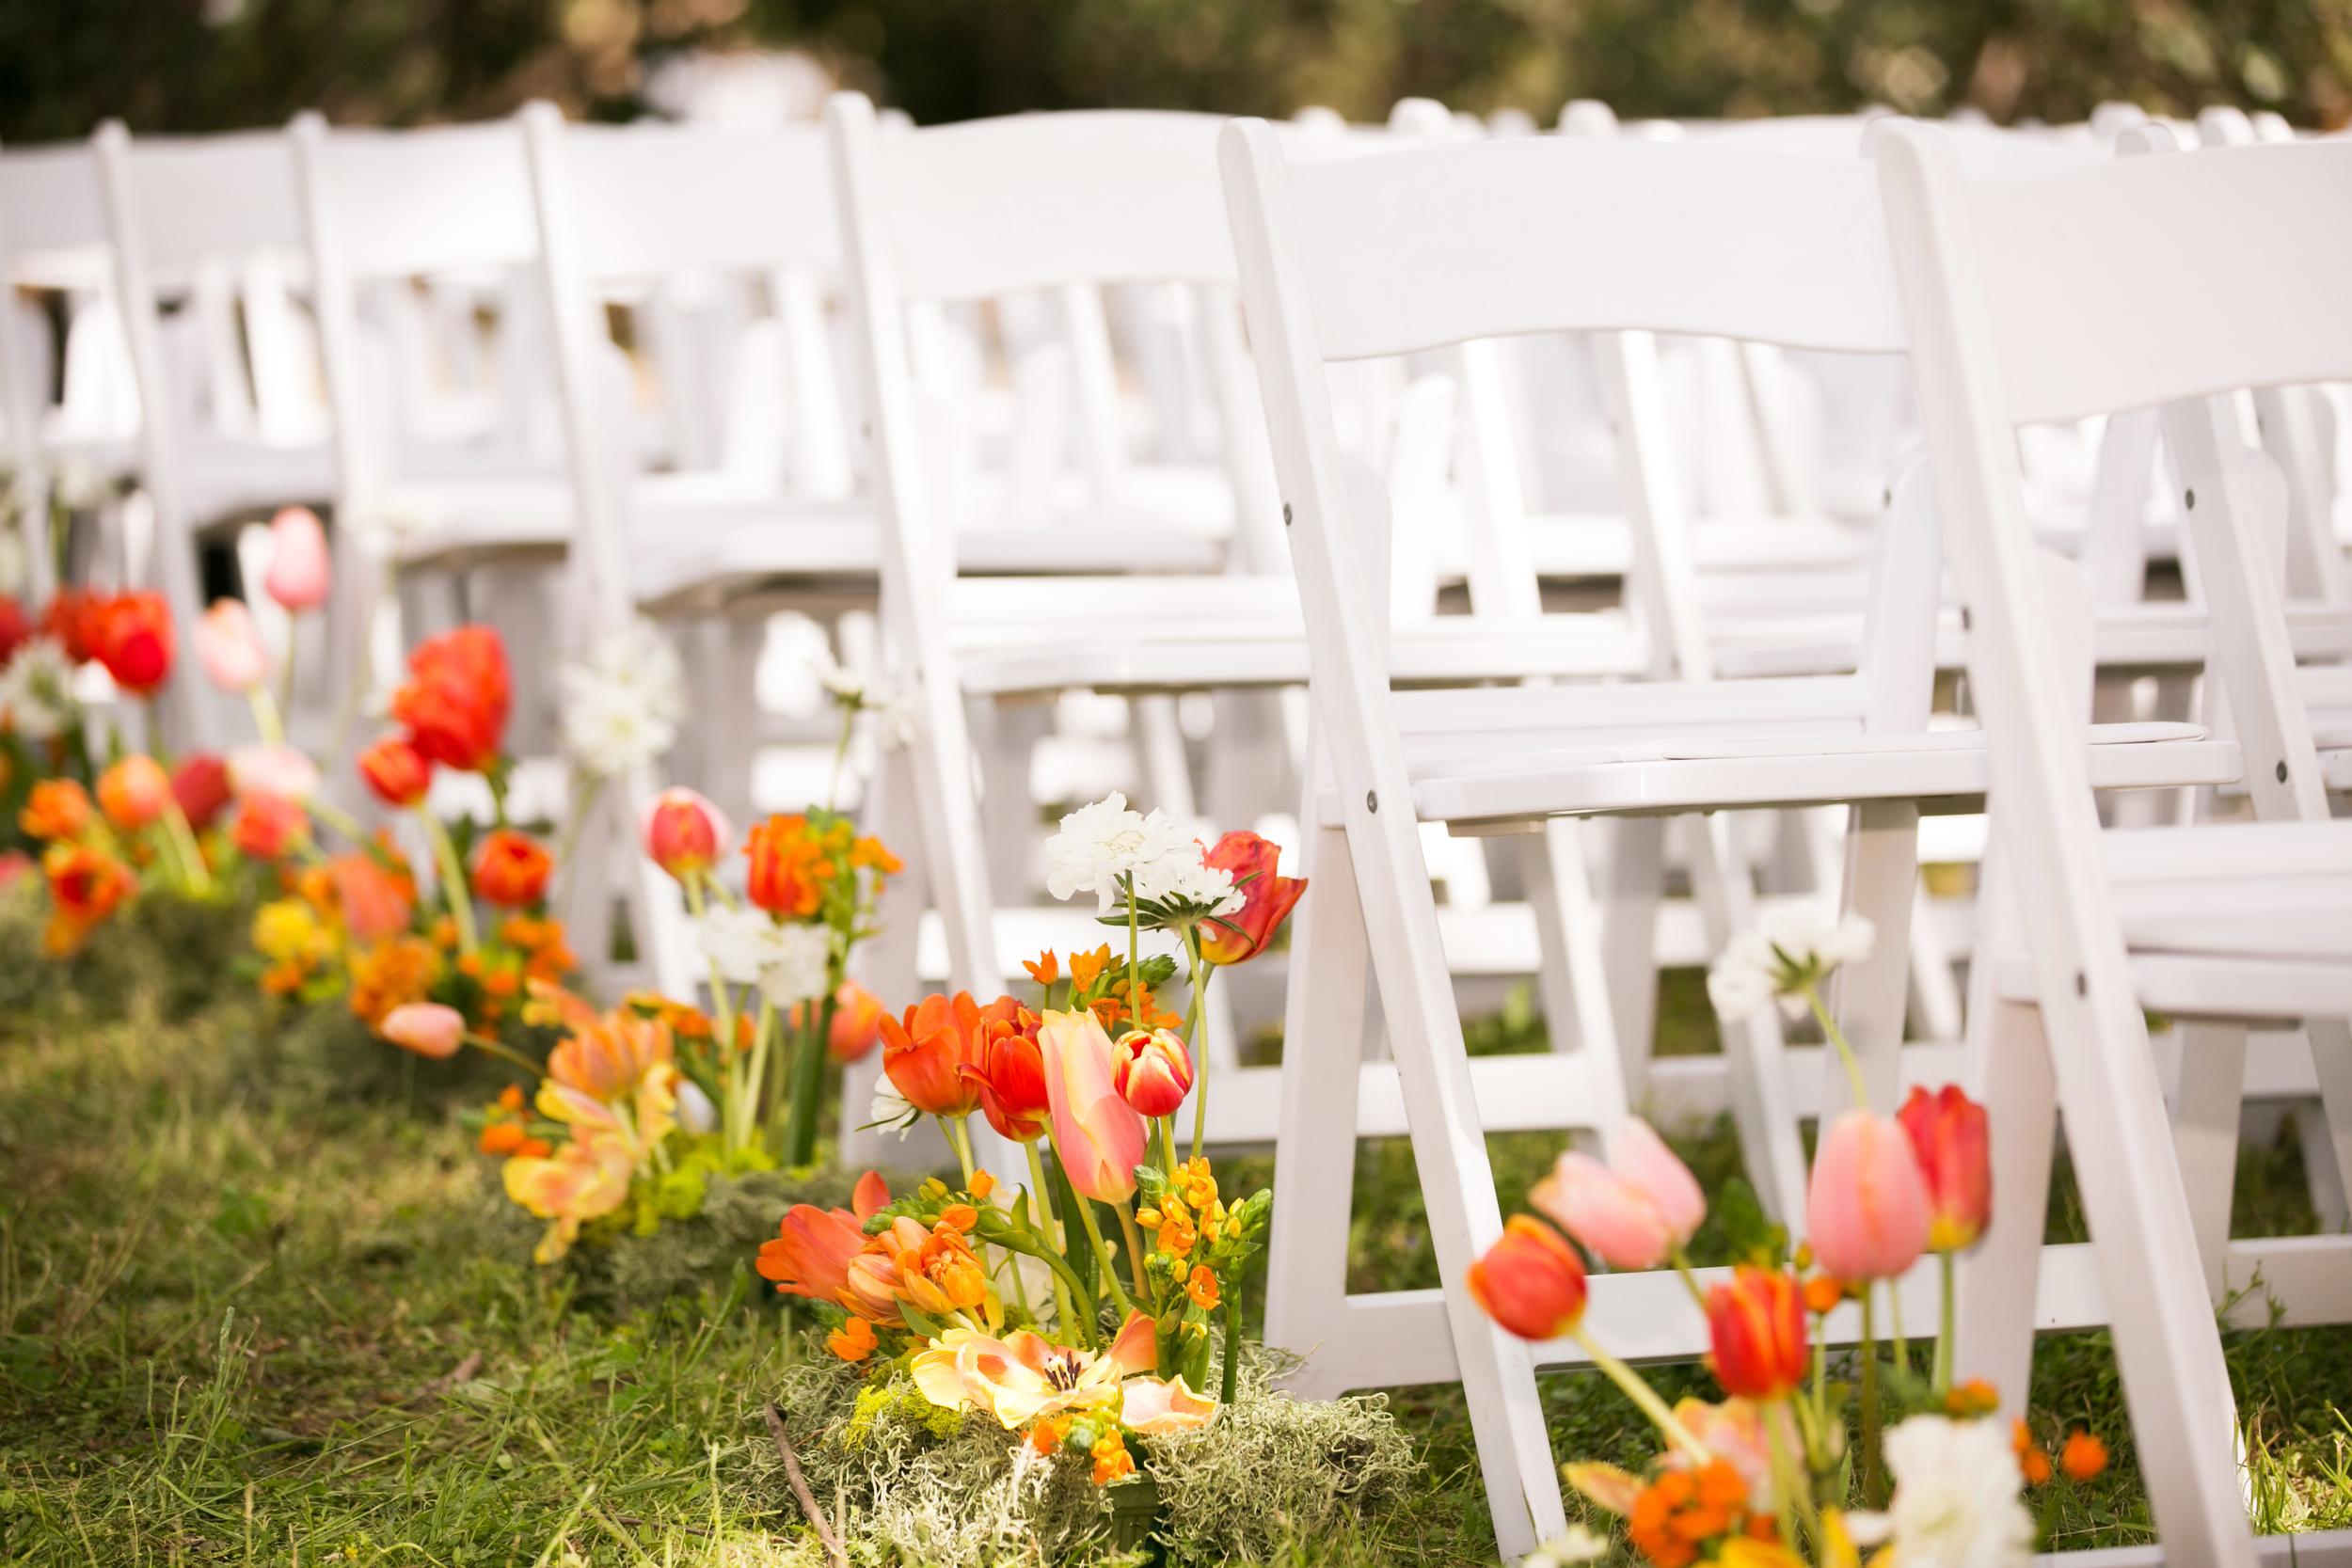 wedding-tuilps-ceremony-aisle-spring.jpg